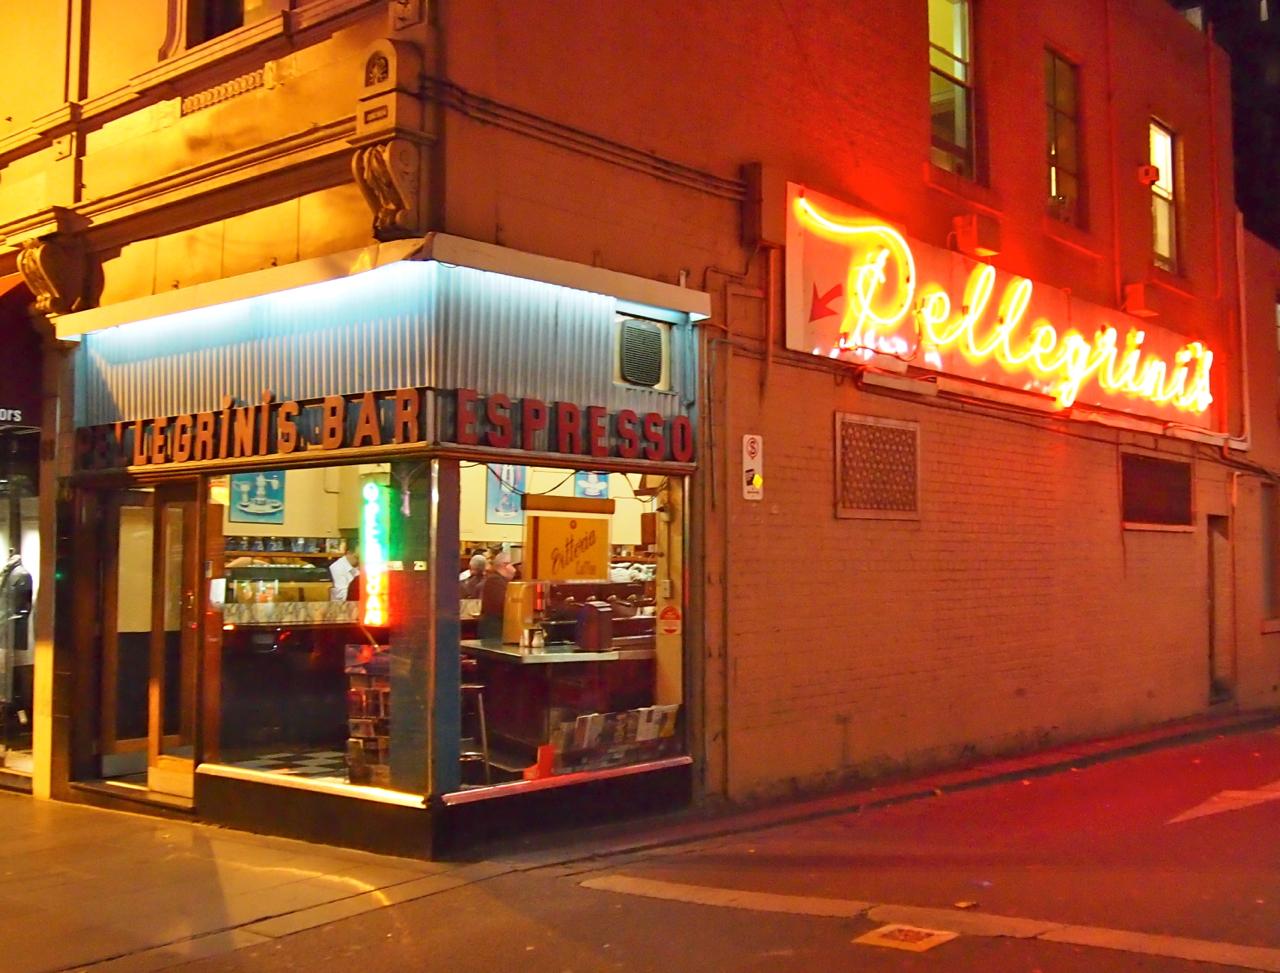 Pellegrini's espresso bar Melbourne